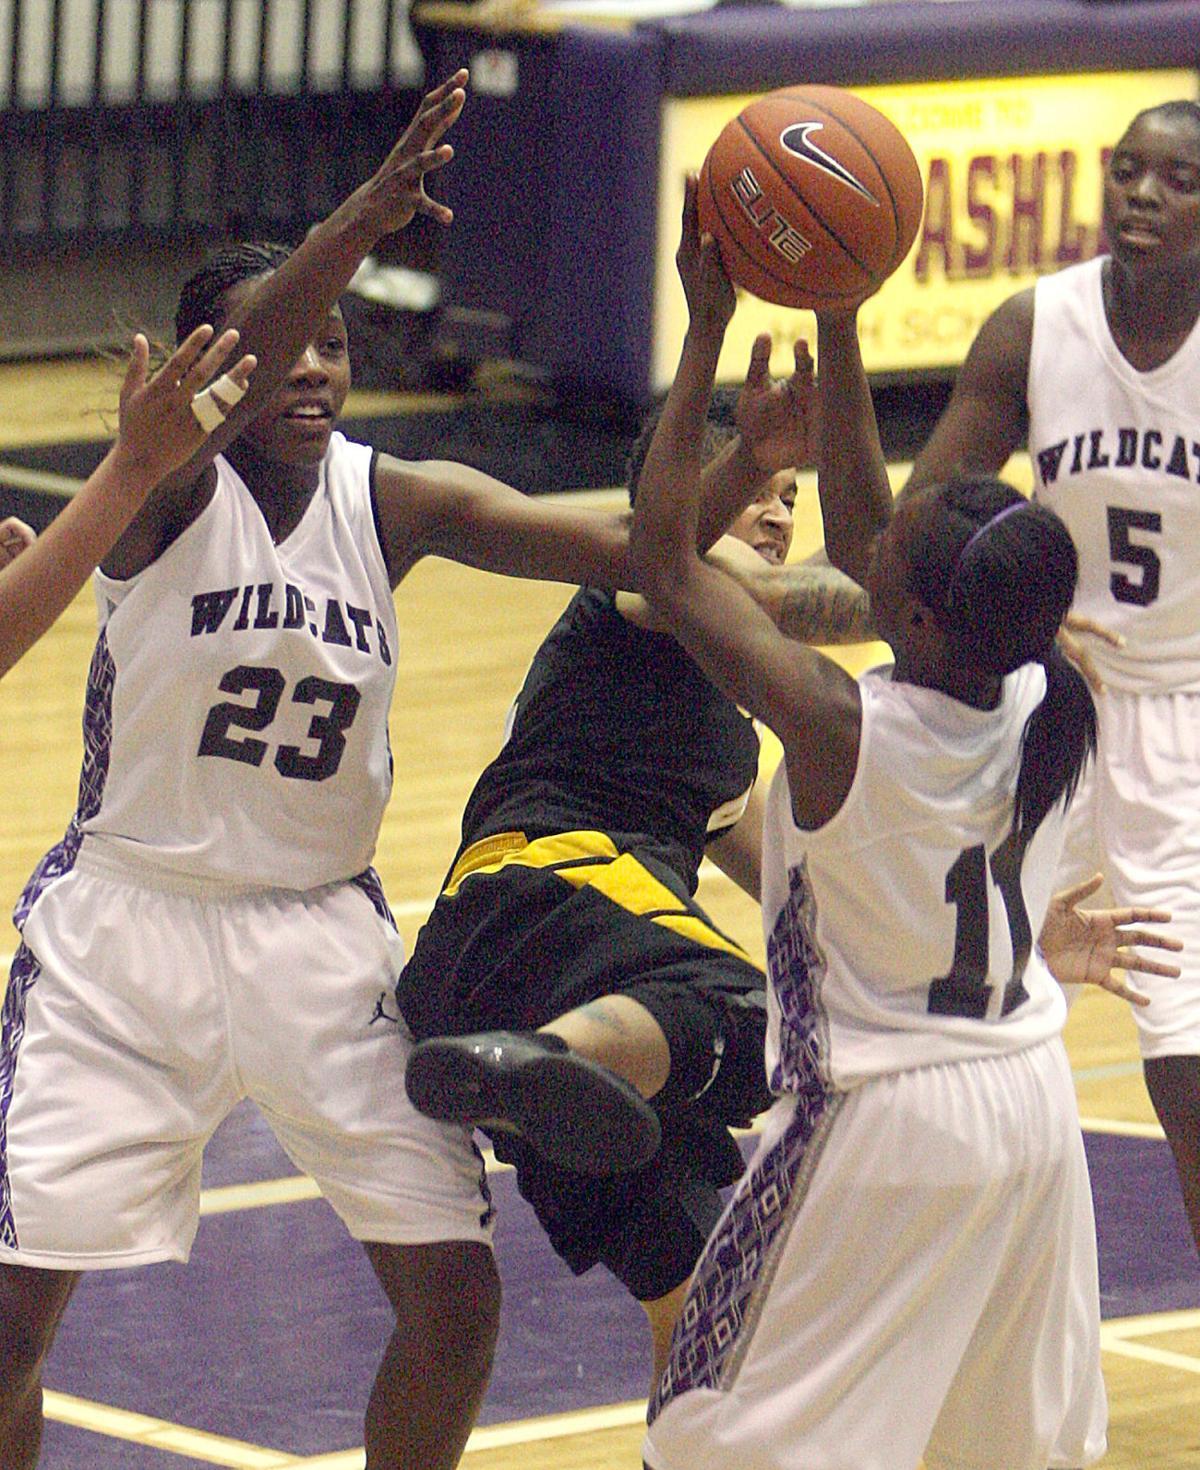 West Ashley vs. Goose Creek girls basketballl